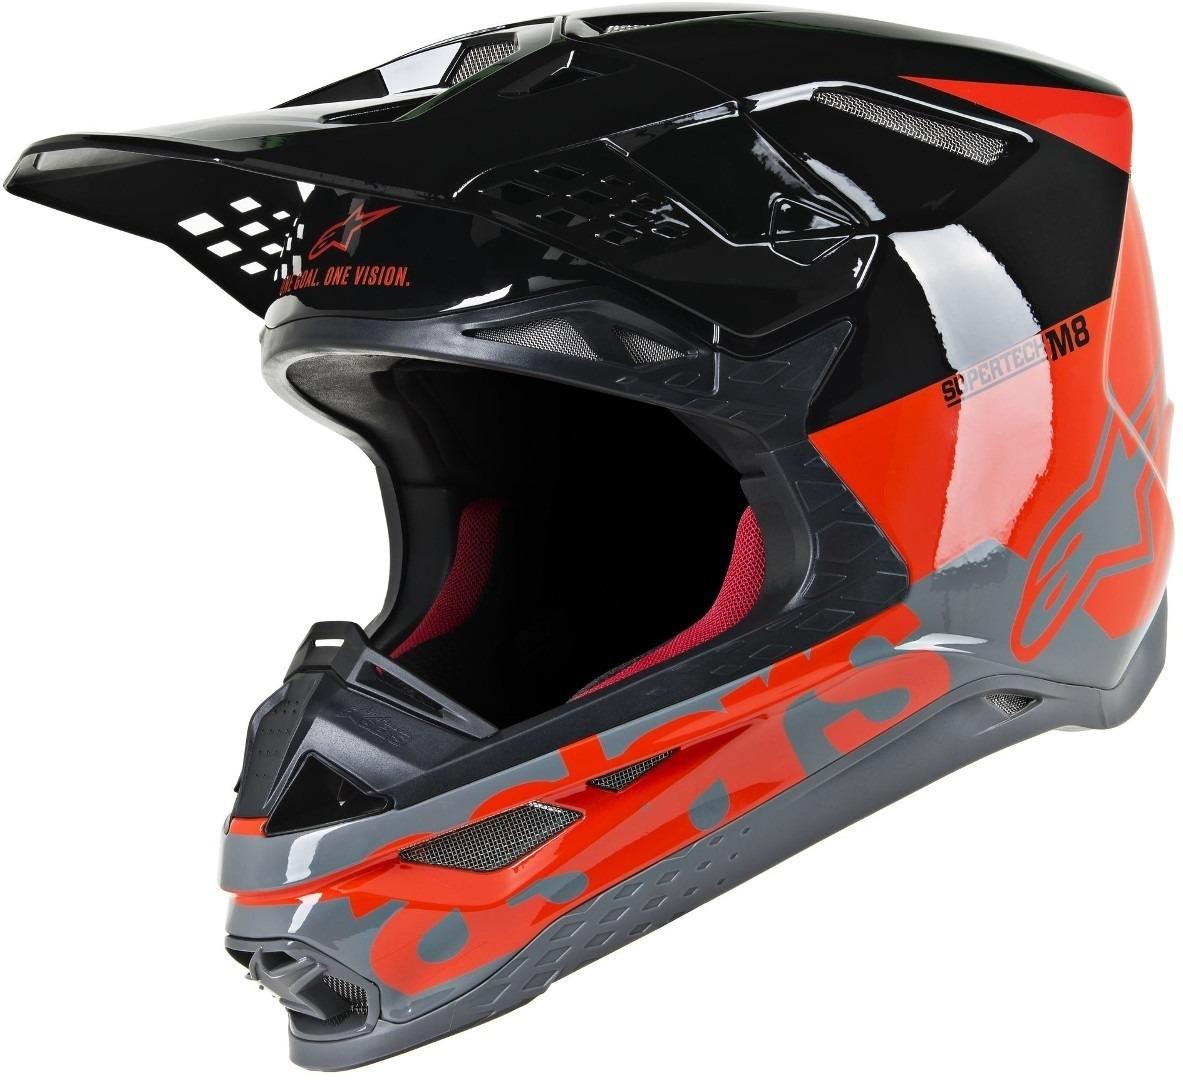 Casco cross Alpinestars Supertech S-M8 RADIUM Red Fluo Black mid Gray Glossy 1